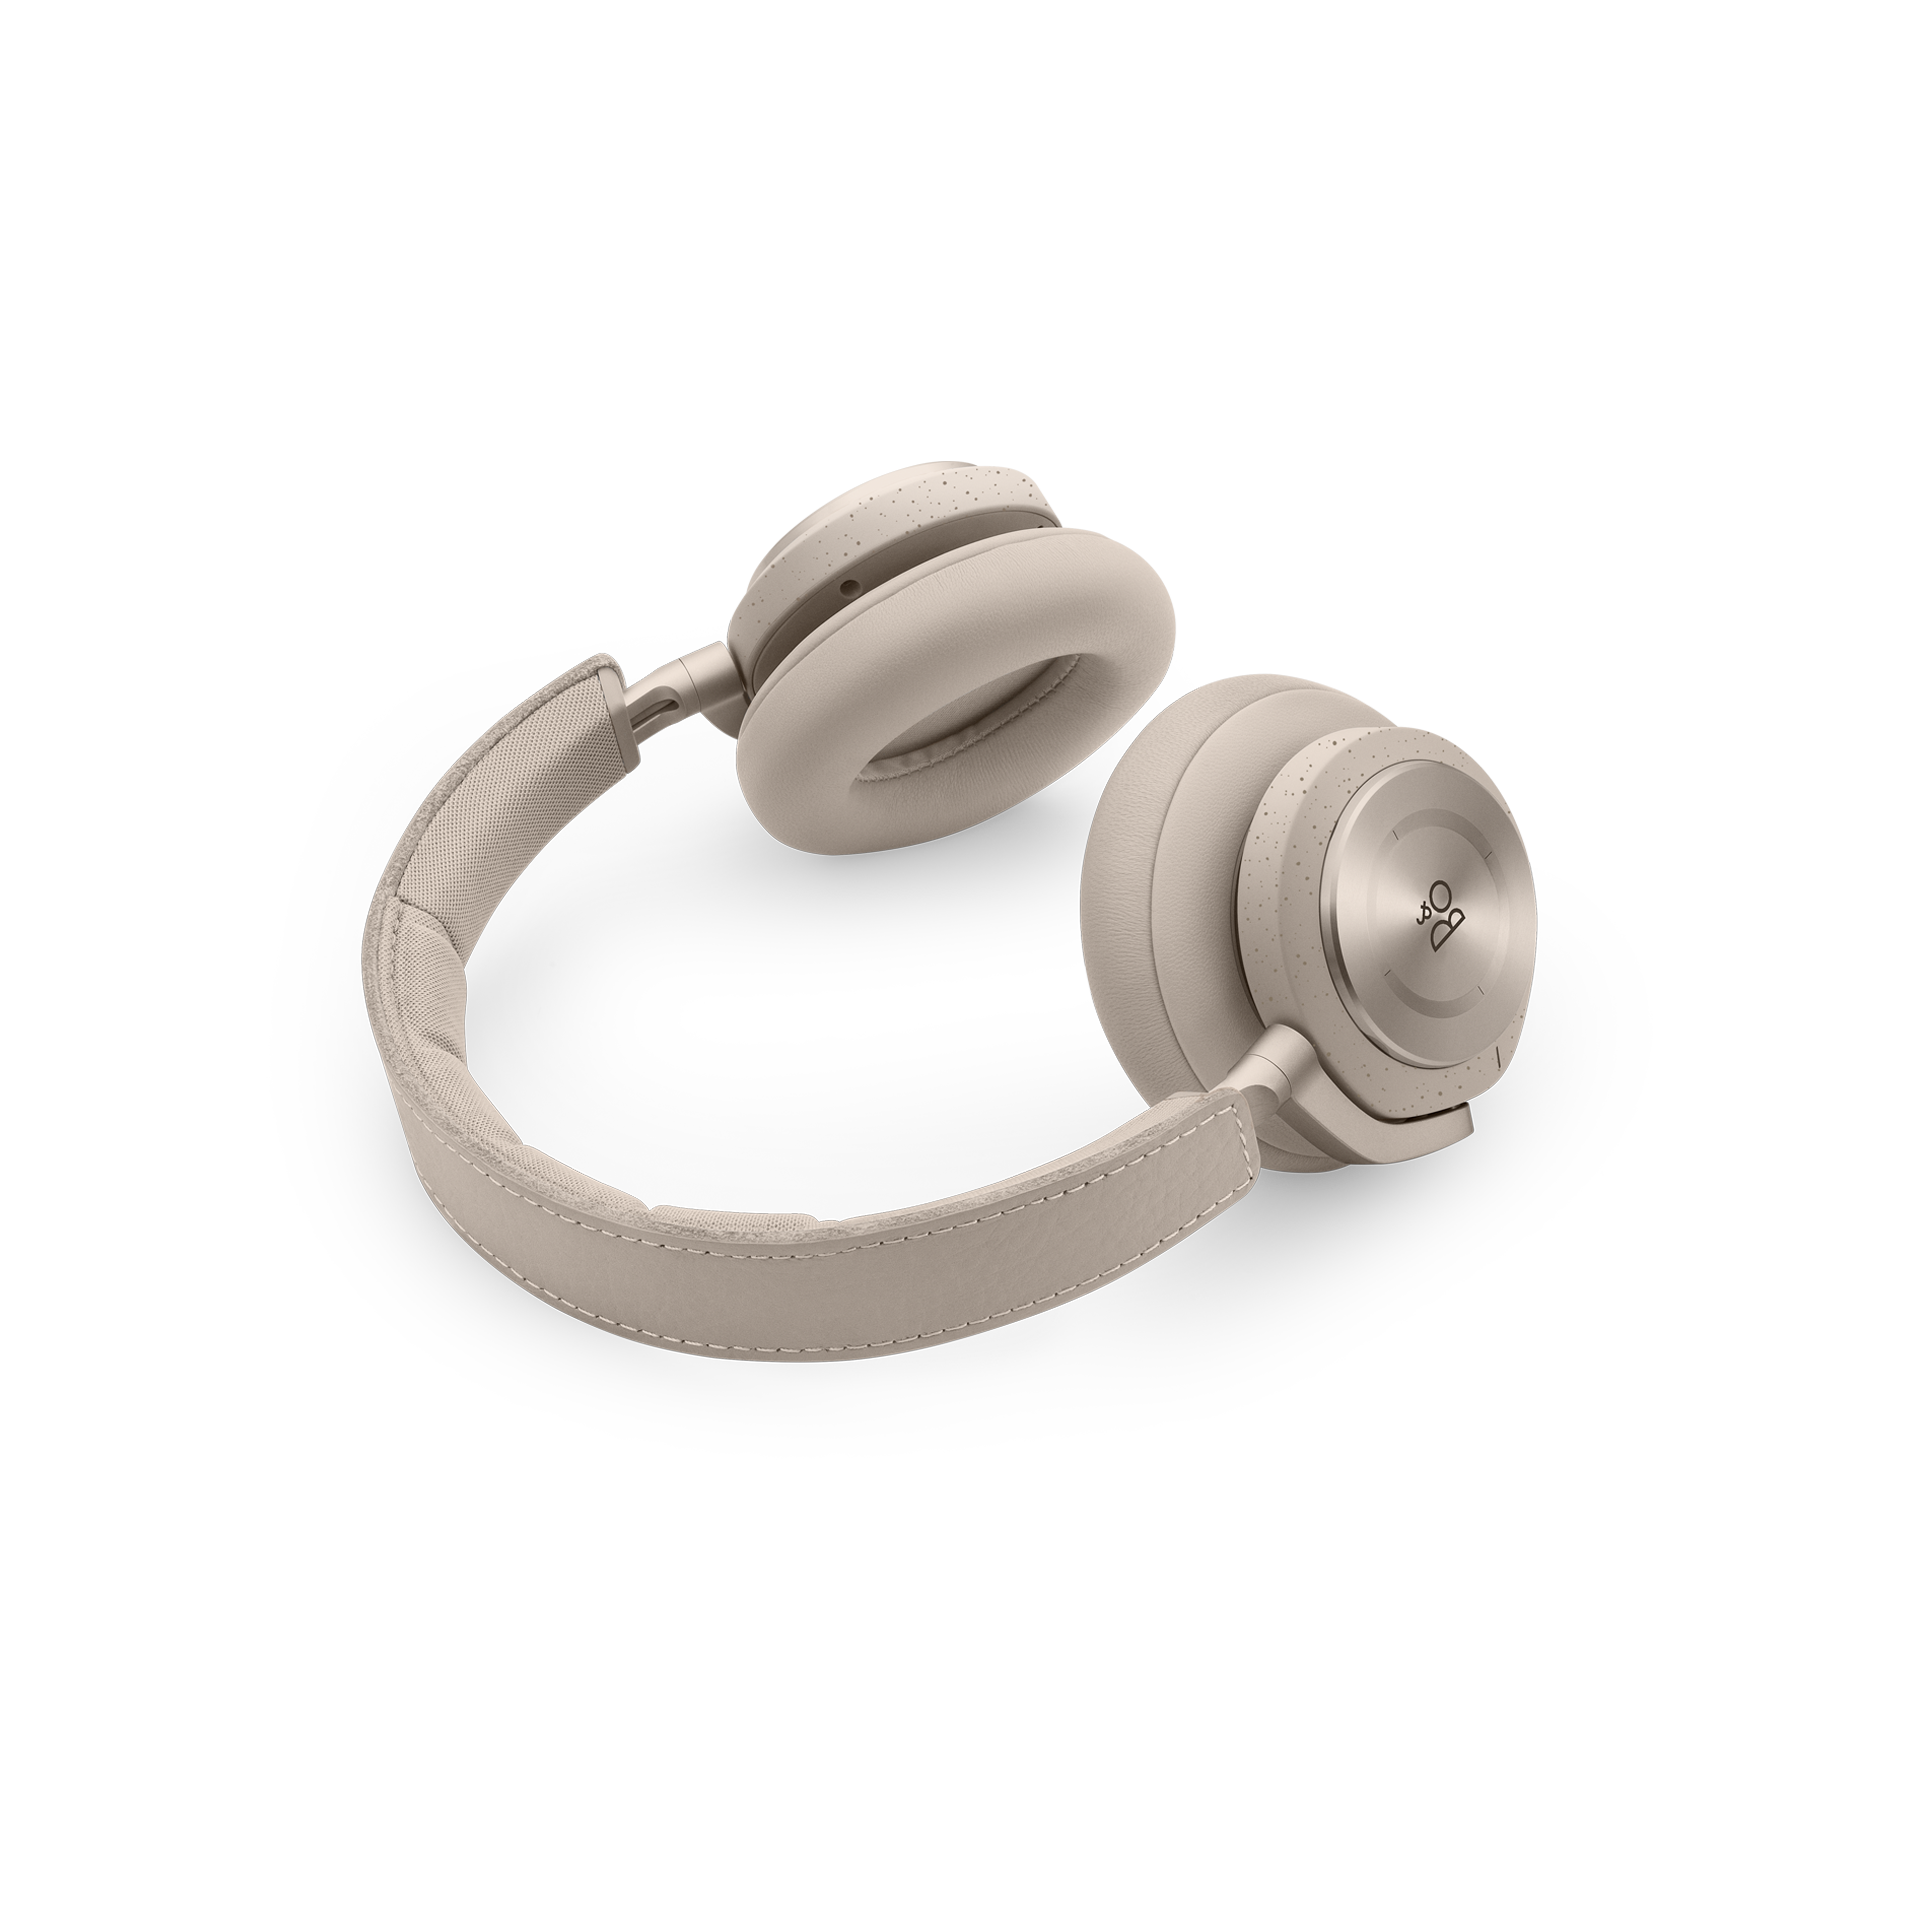 d3ecace2251 Beoplay H9i Pine - Over-ear Headphones   B&O